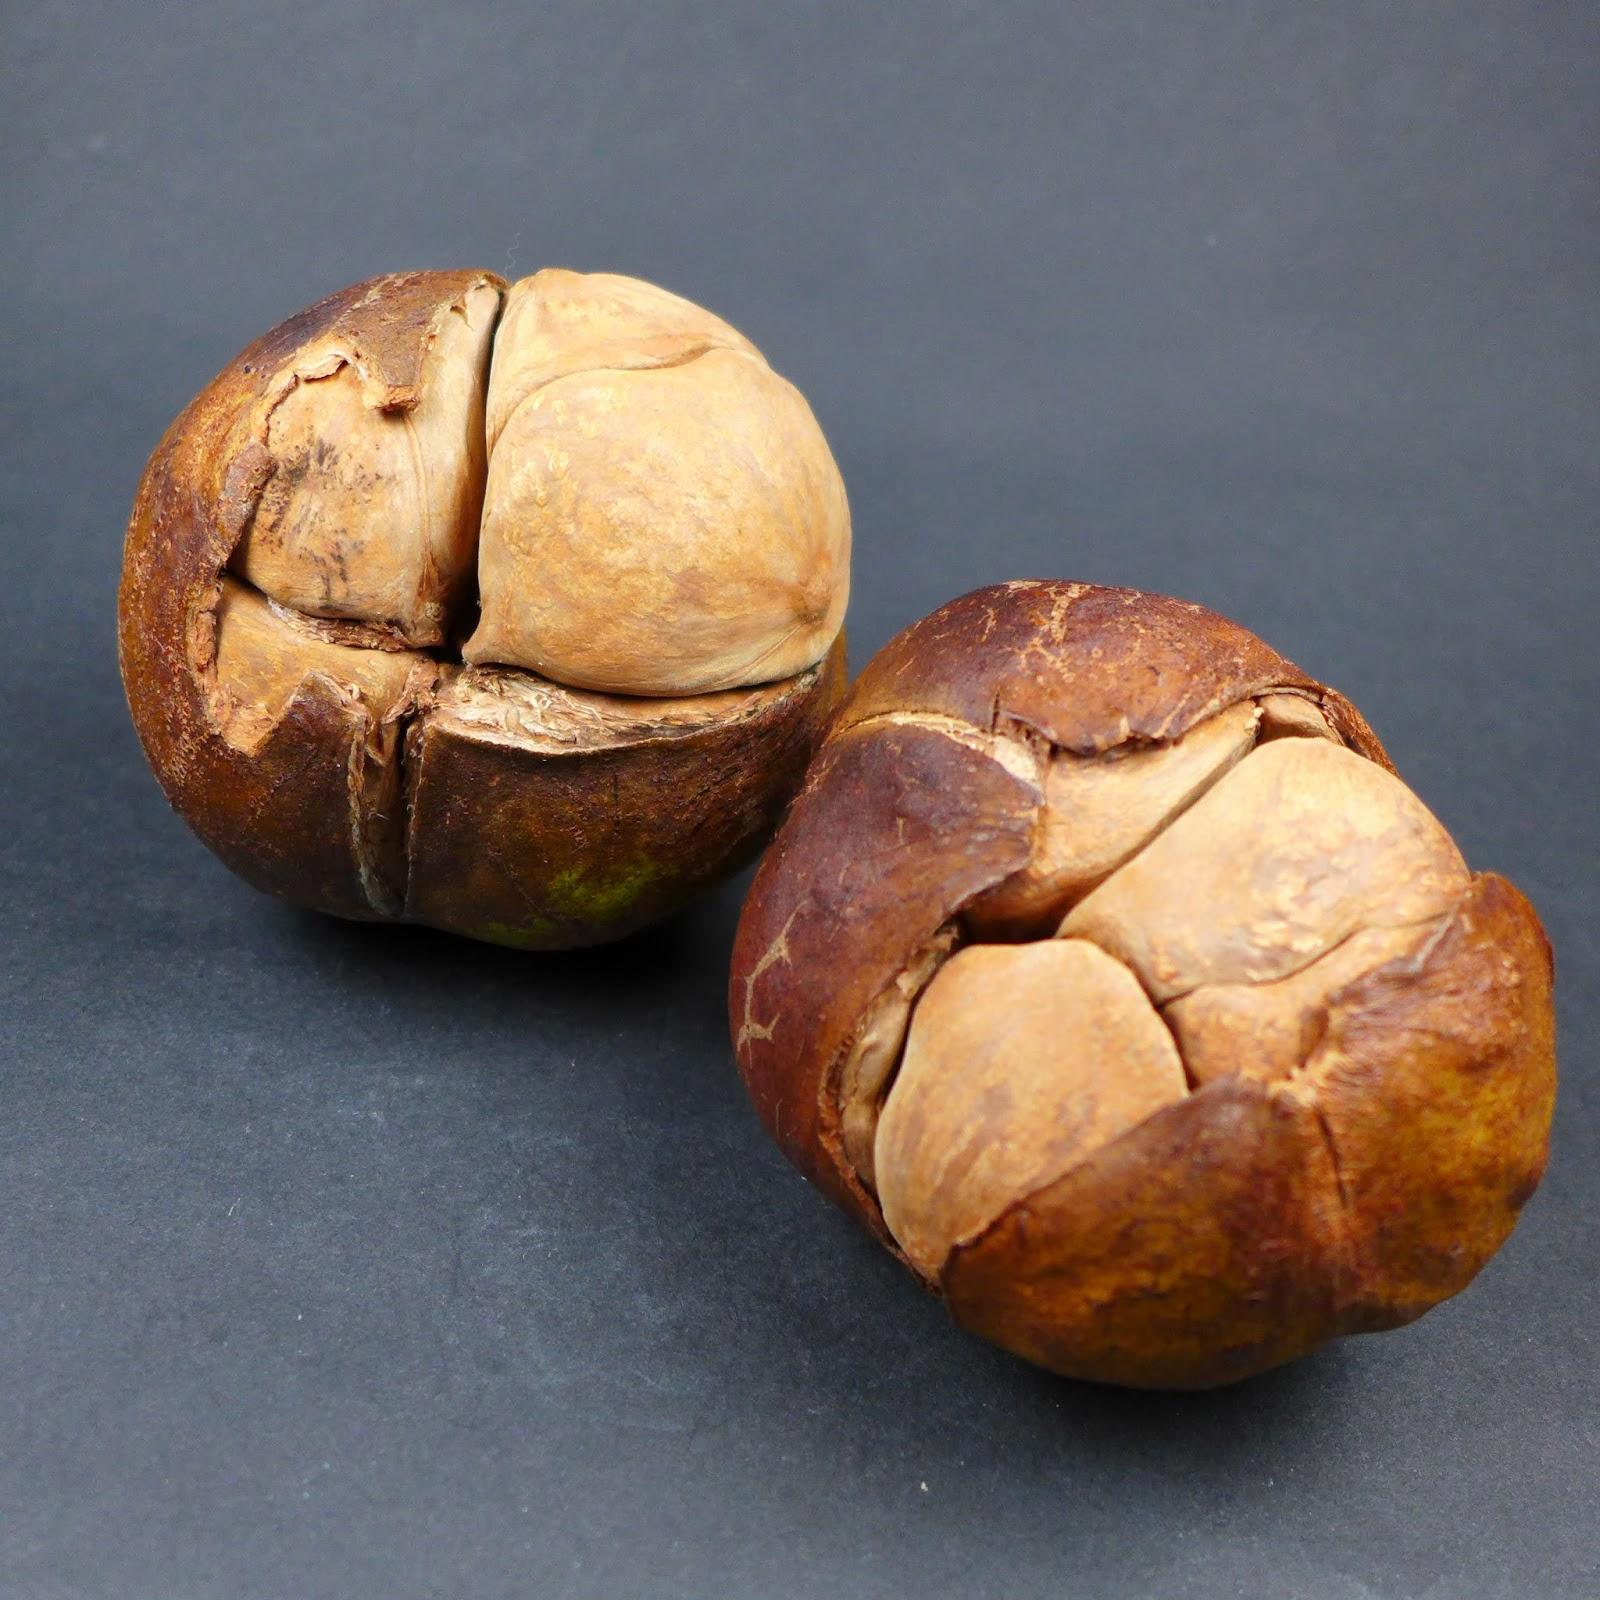 puzzlenut1.JPG